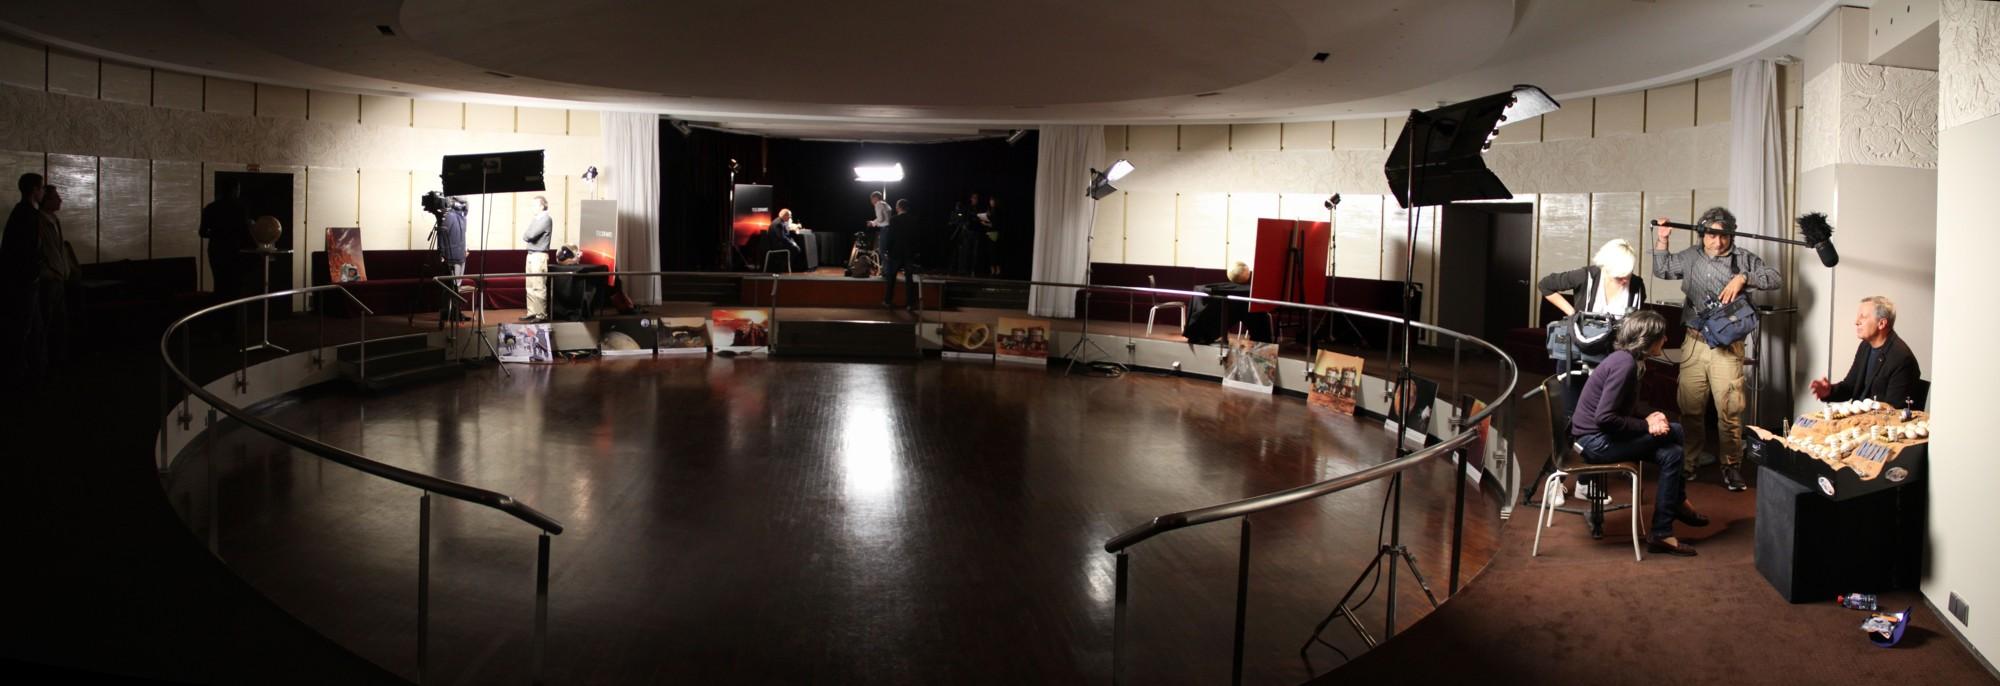 Les interviews en bas